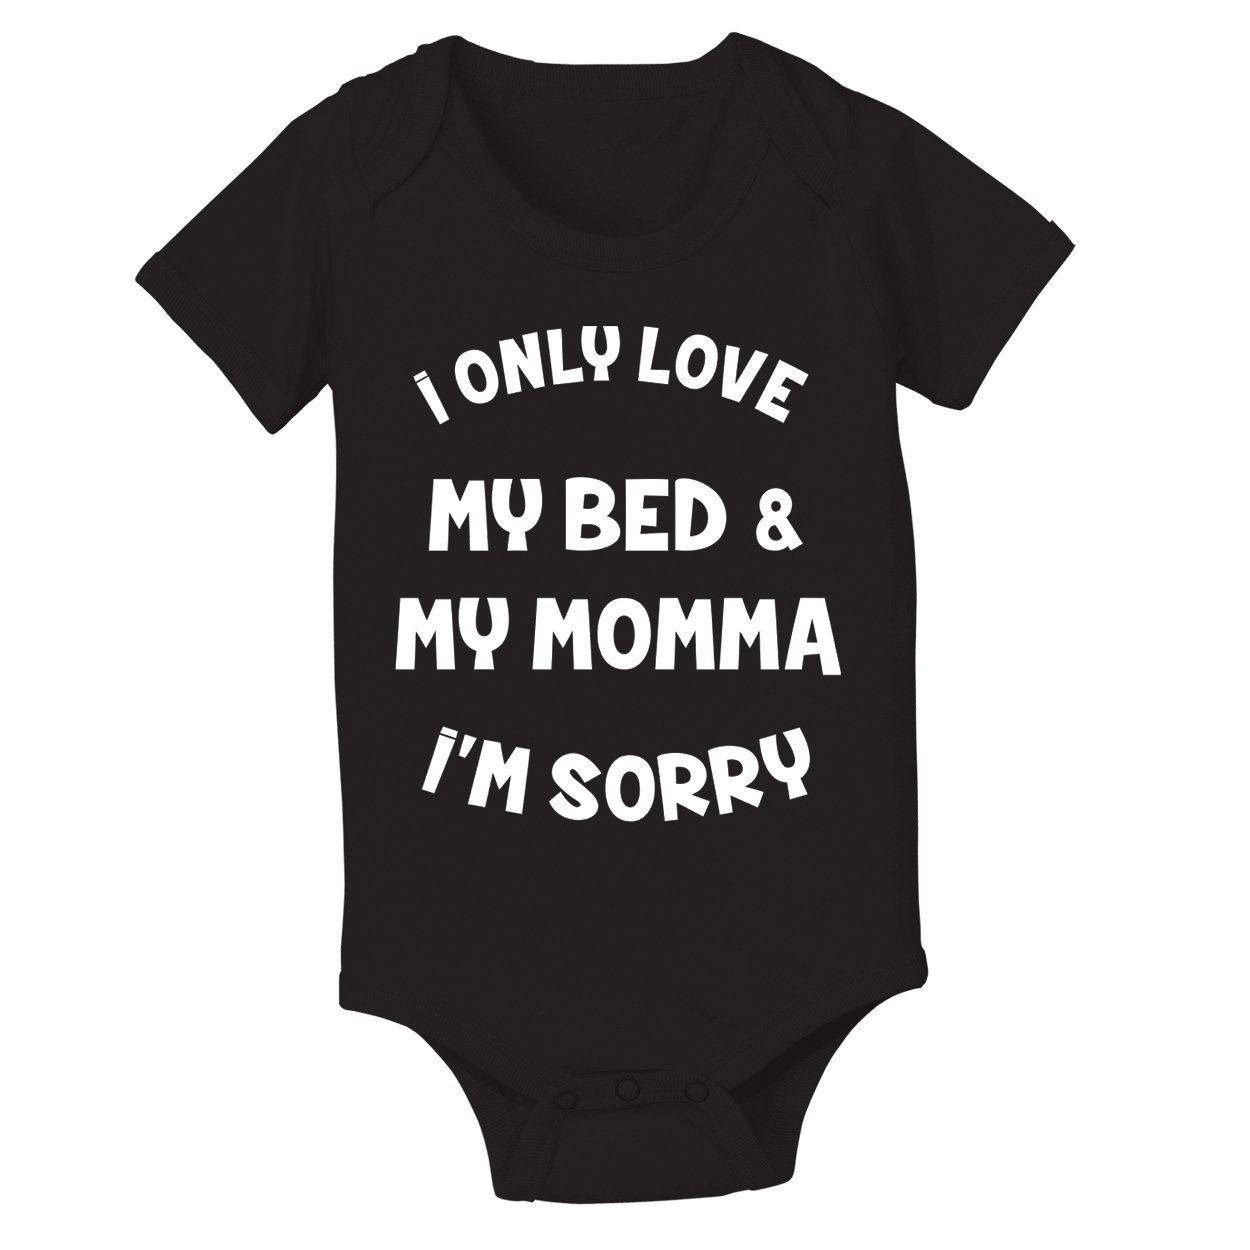 d3d960a23 I ONLY LOVE MY BED AND MY MOMMA IM SORRY Baby Onesie #drake #godsplan #cute  #baby #outfit #newborn